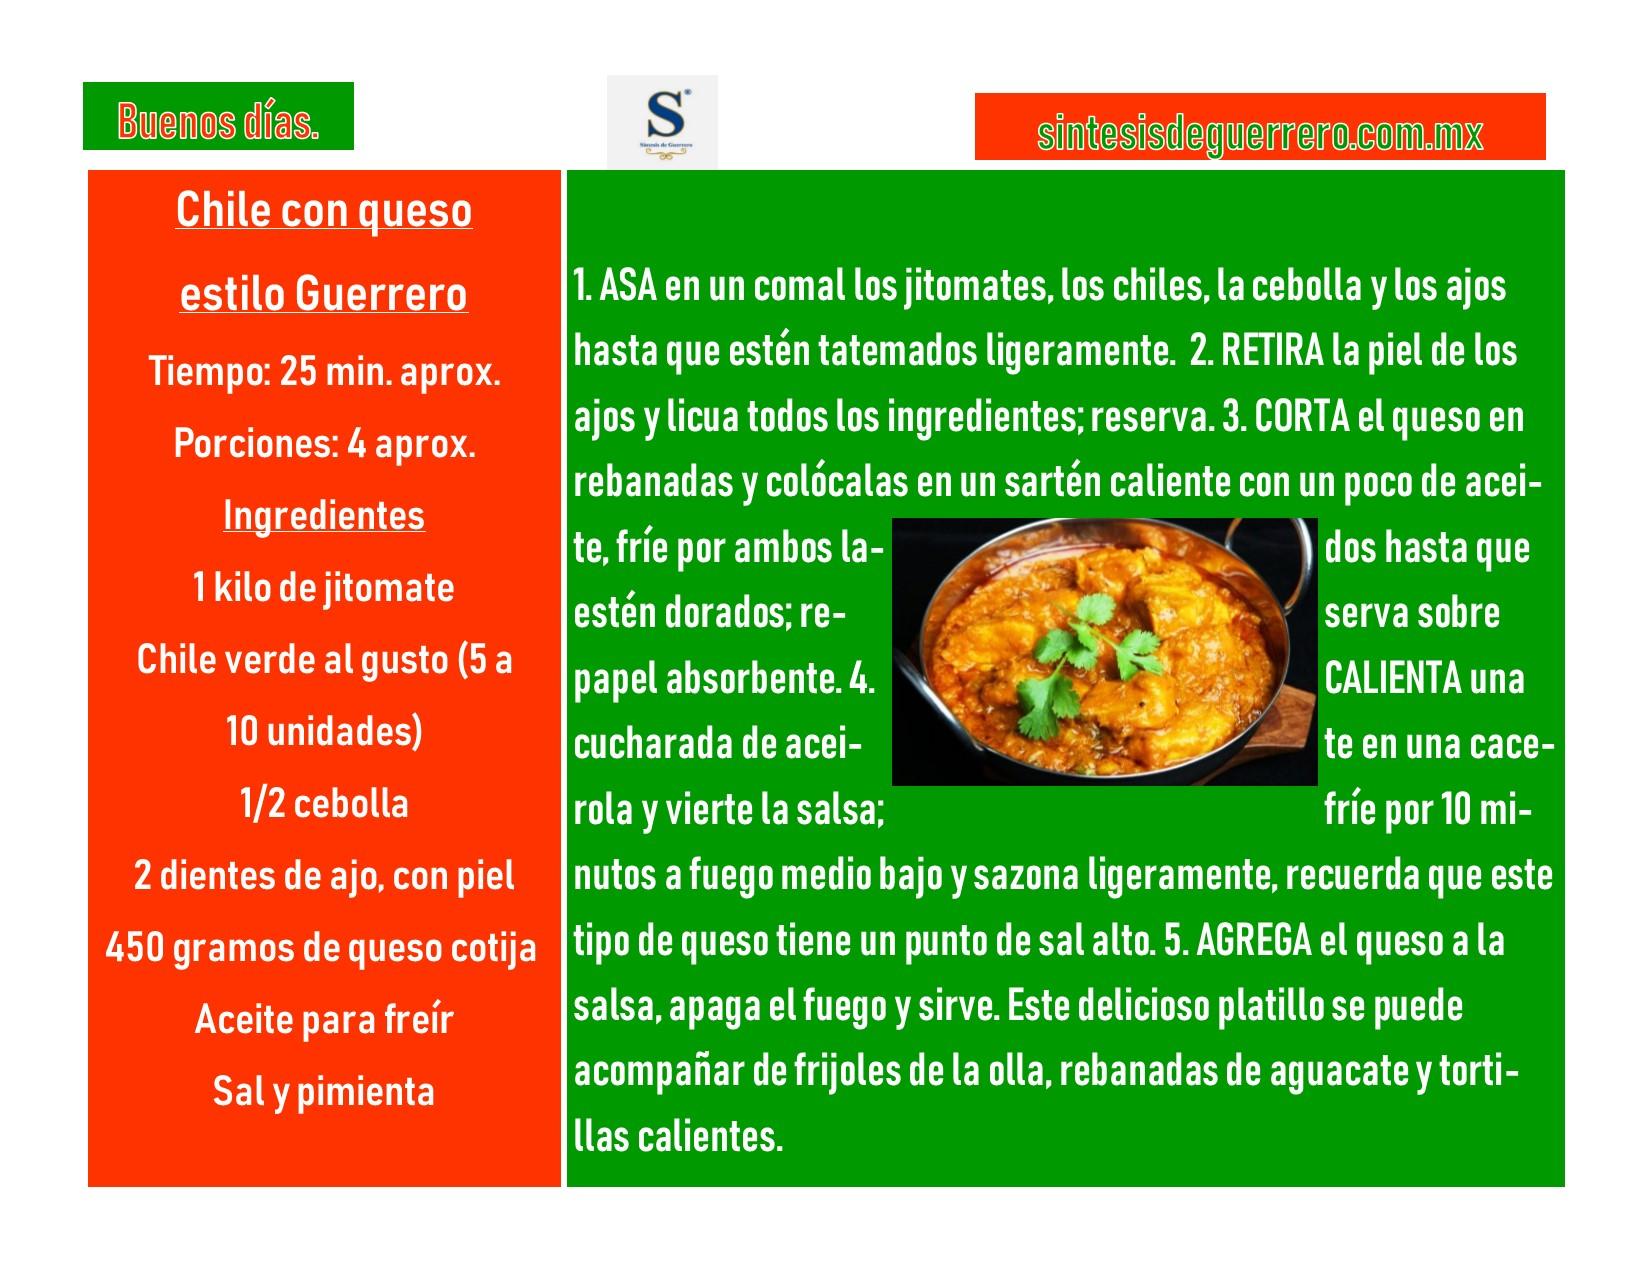 Buenos días. Chile con queso estilo Guerrero